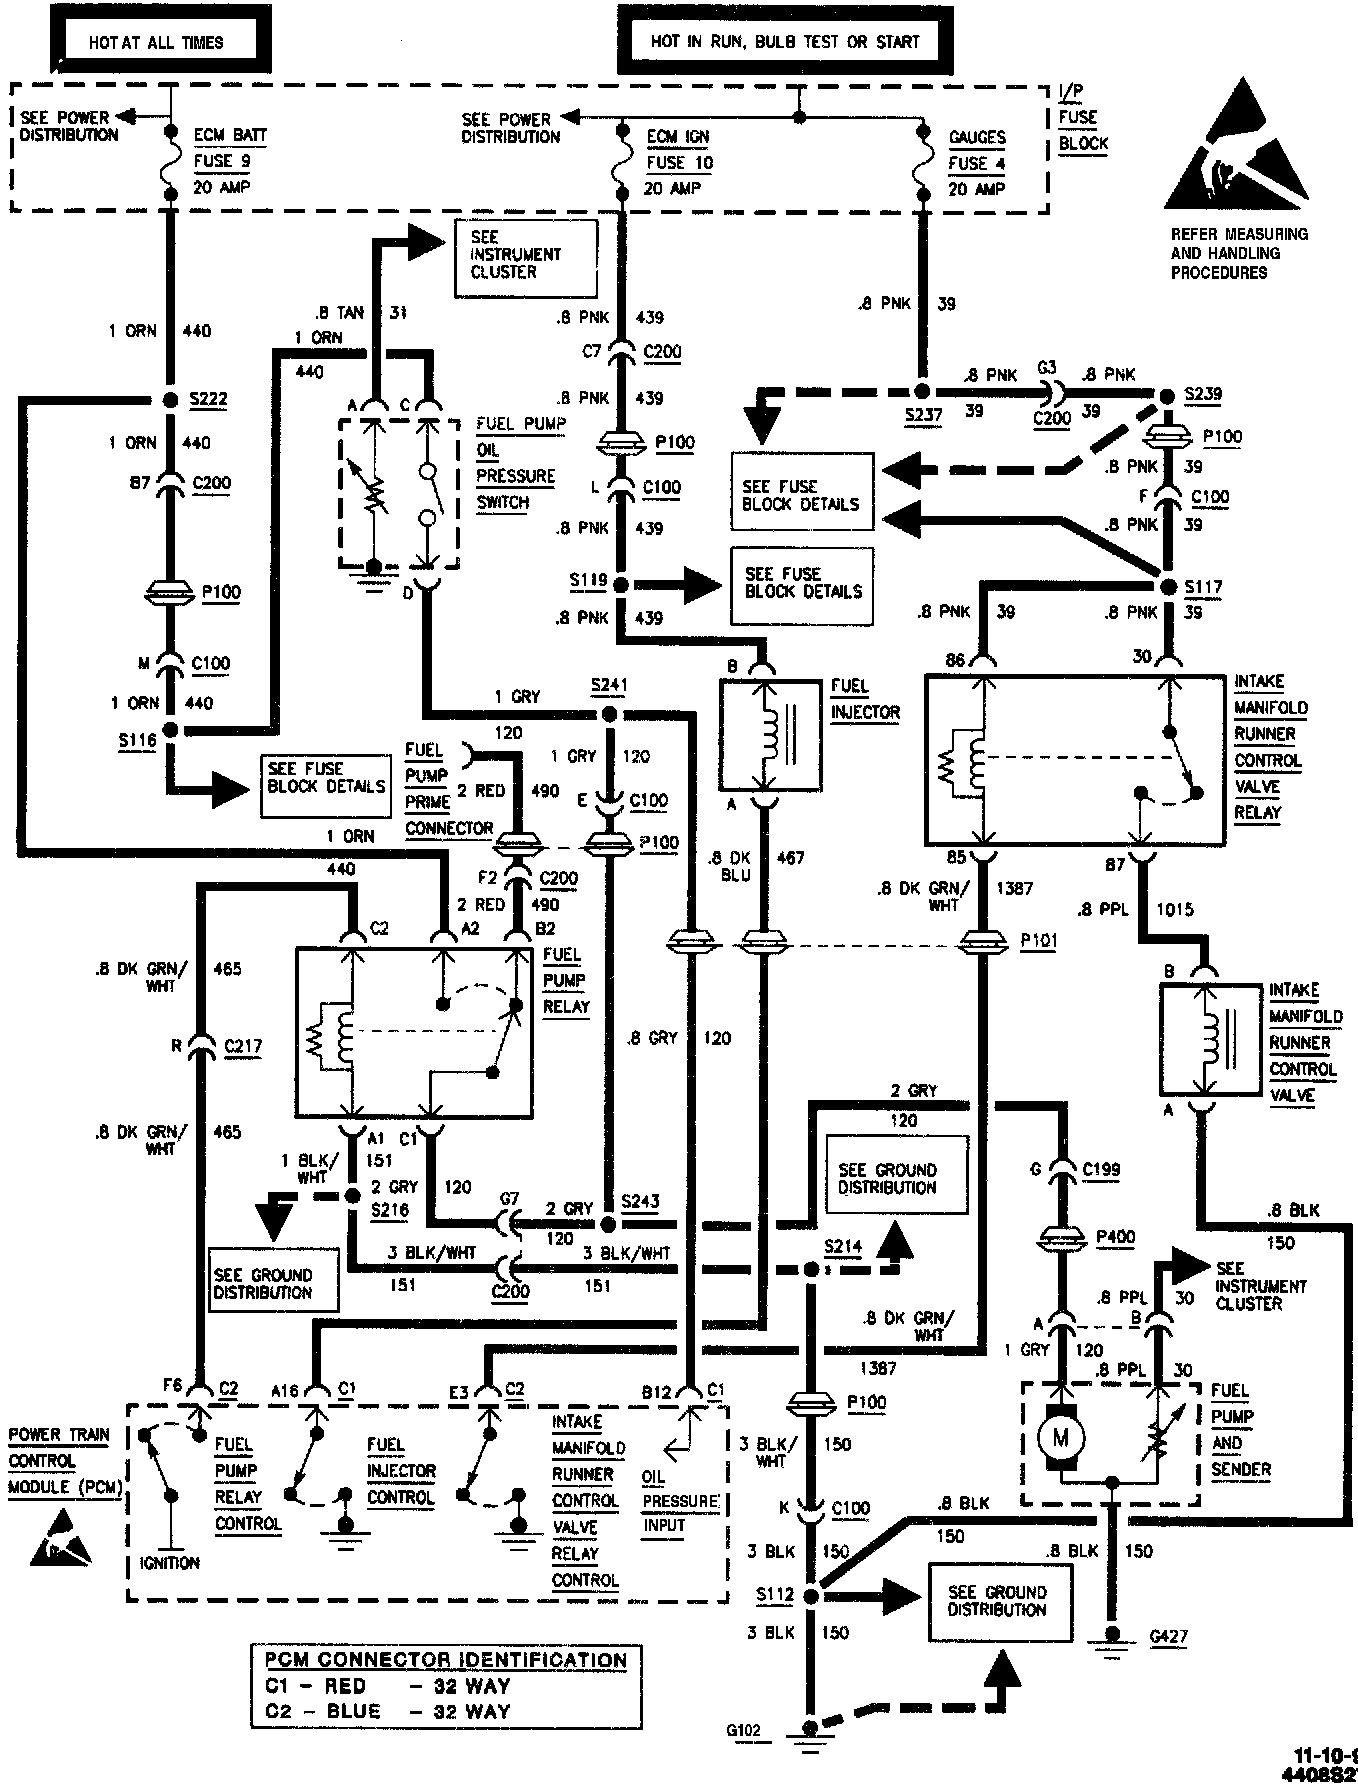 2001 S10 Tail Light Wiring Diagram In 2021 Chevy S10 Diagram Design Diagram